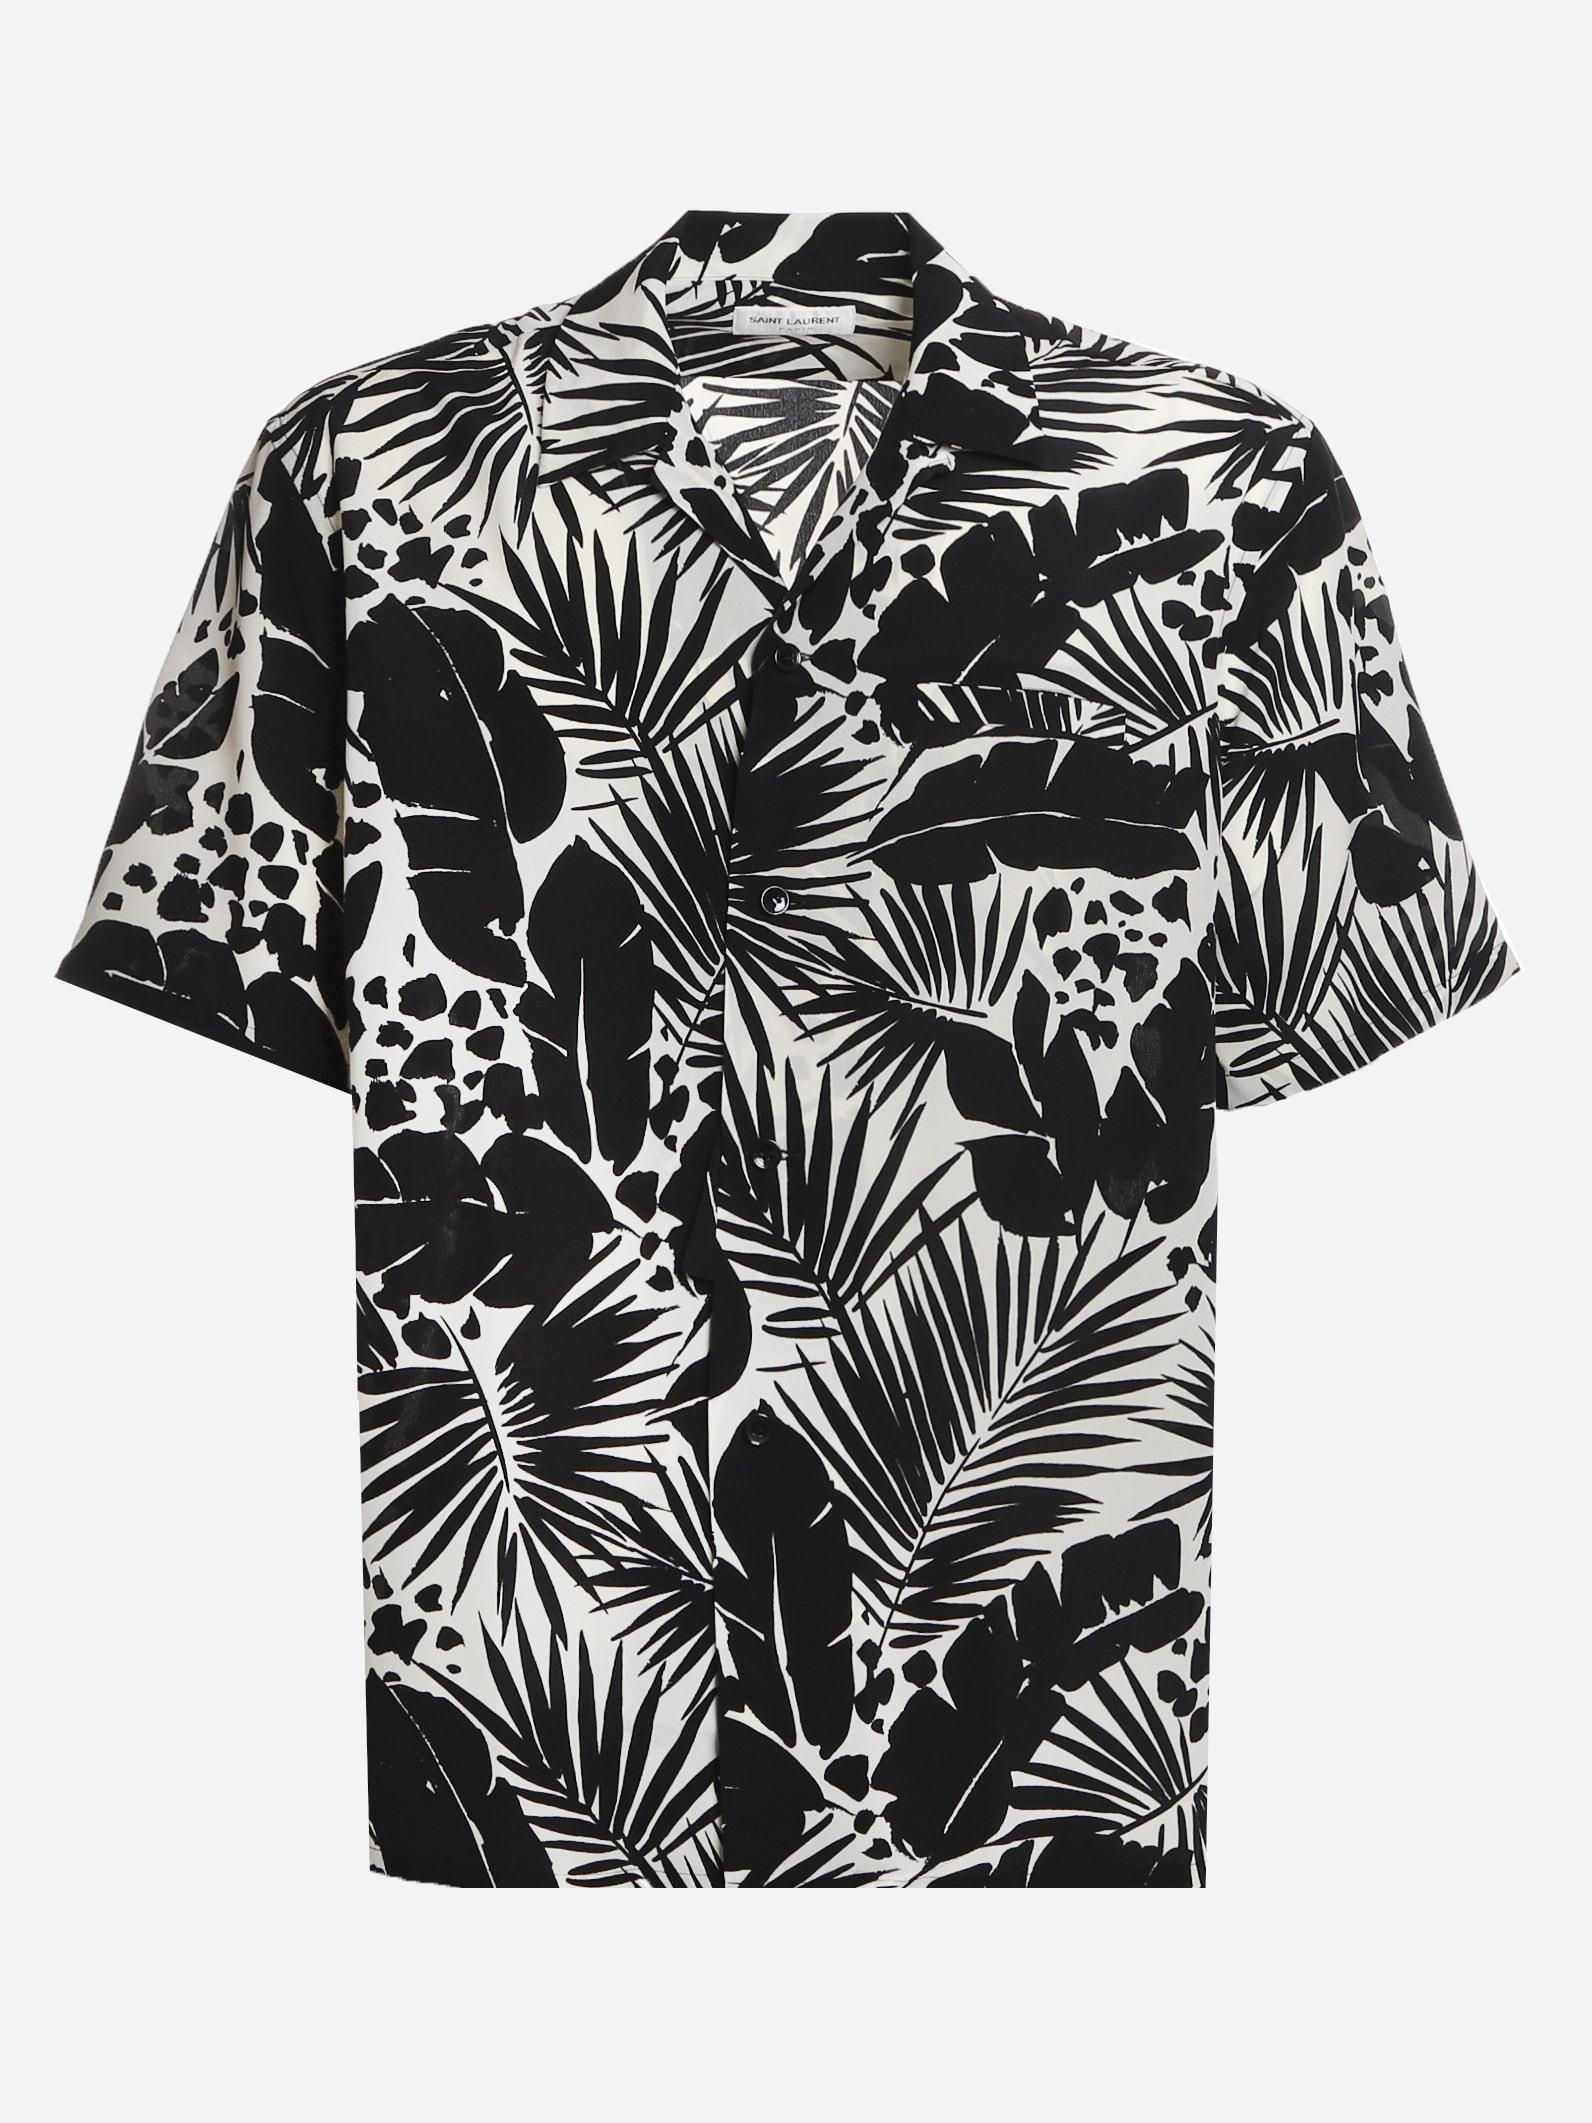 Saint Laurent Shirts SILK SHIRT WITH TROPICAL LEAF MOTIF